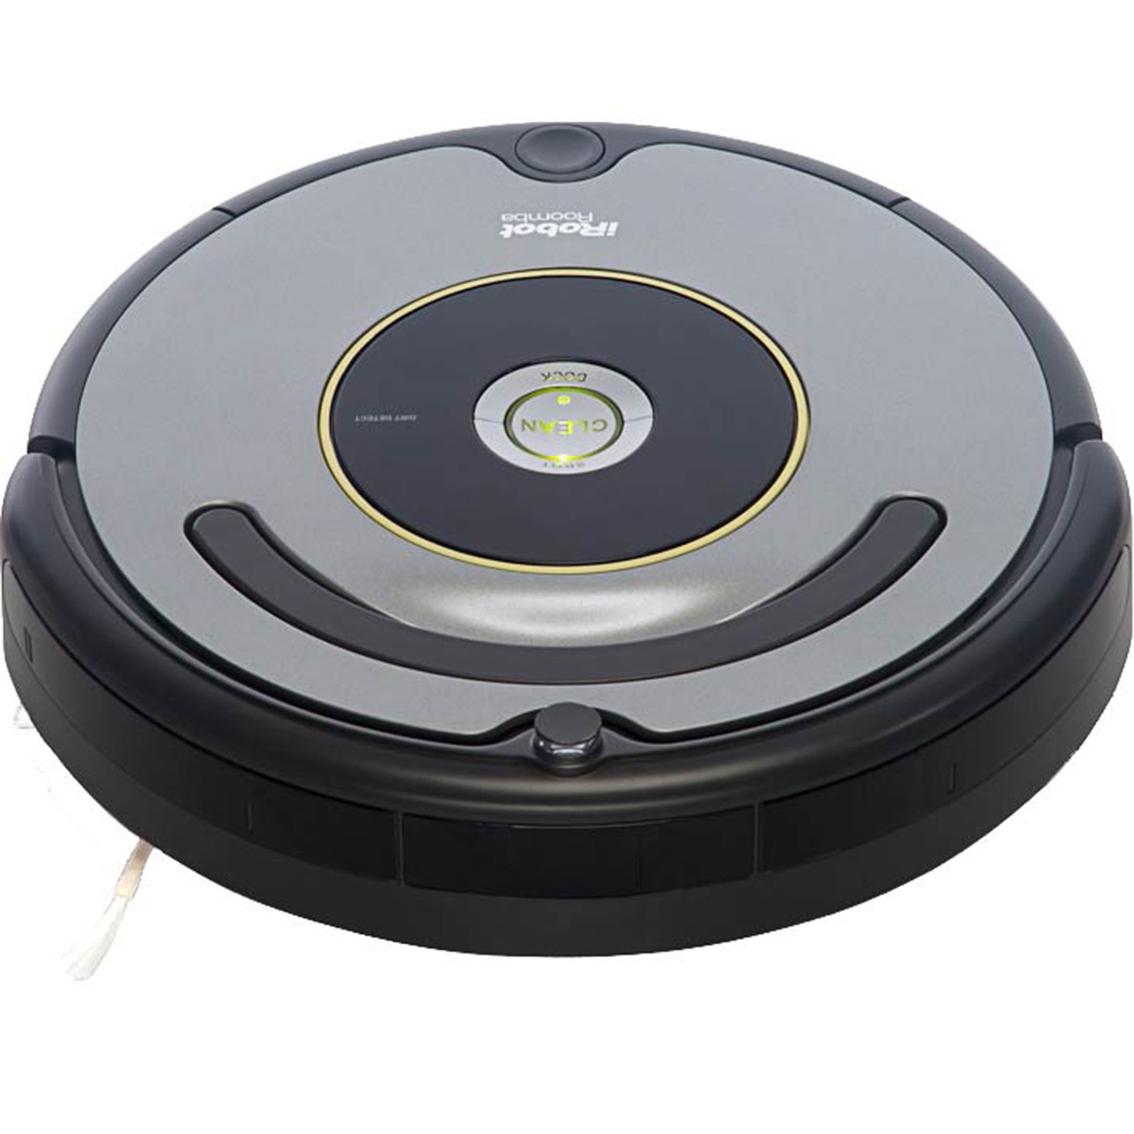 irobot roomba 630 vacuum cleaning robot robotics. Black Bedroom Furniture Sets. Home Design Ideas